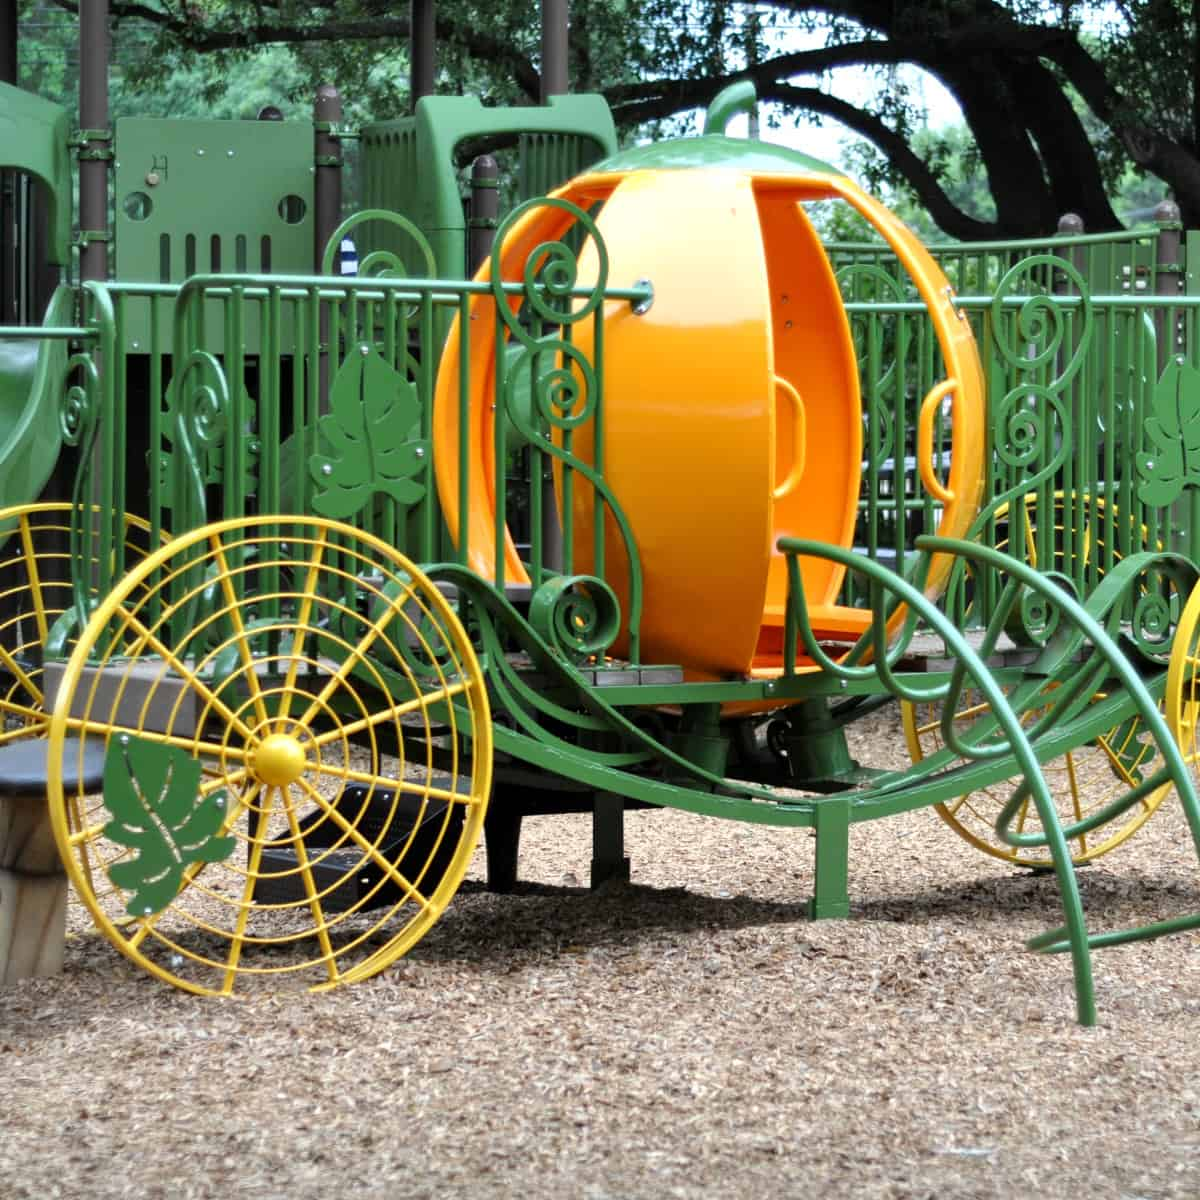 Pumpkin Carraige at River Oaks Pumpkin Park